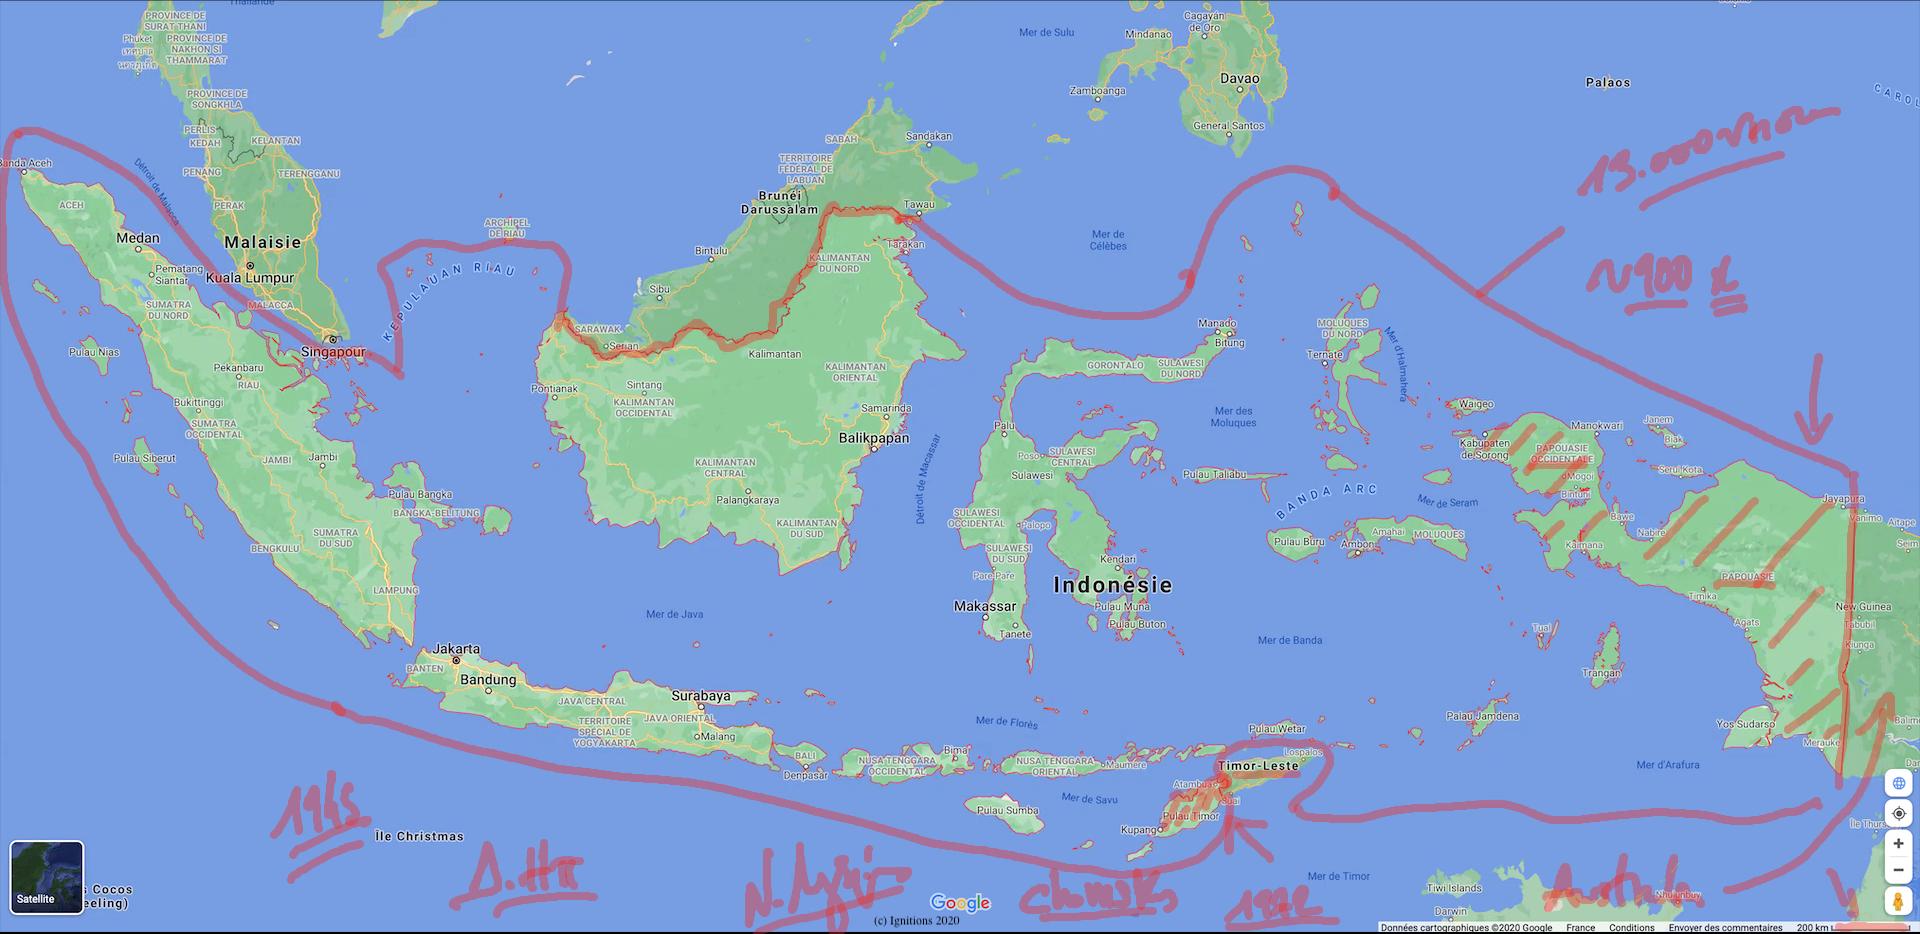 56542 - II - e-Μάθημα: Χρονοστρατηγική ανάλυση Ινδονησίας. (Dessin)